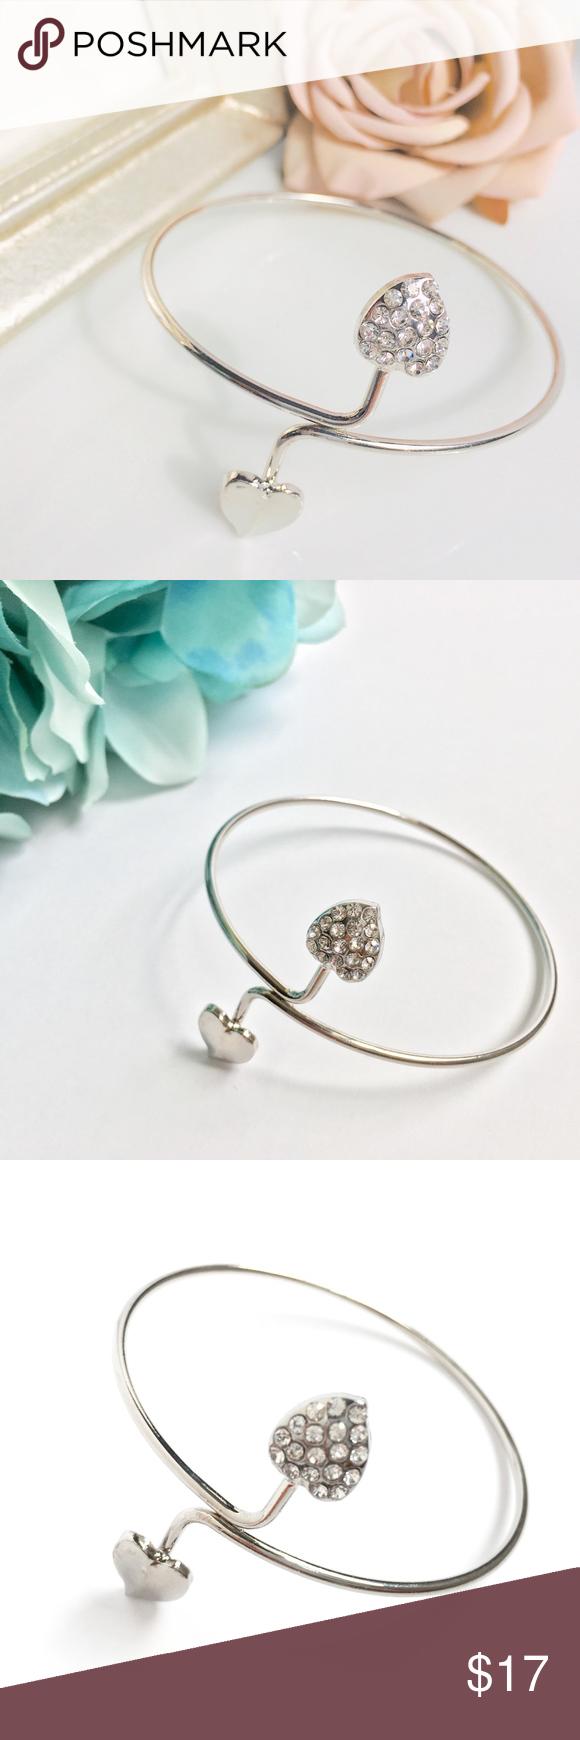 Photo of Double Heart Swish Silber Armreif Armband Bundle 3 Schmuckstücke für $ 35! (Bundl …